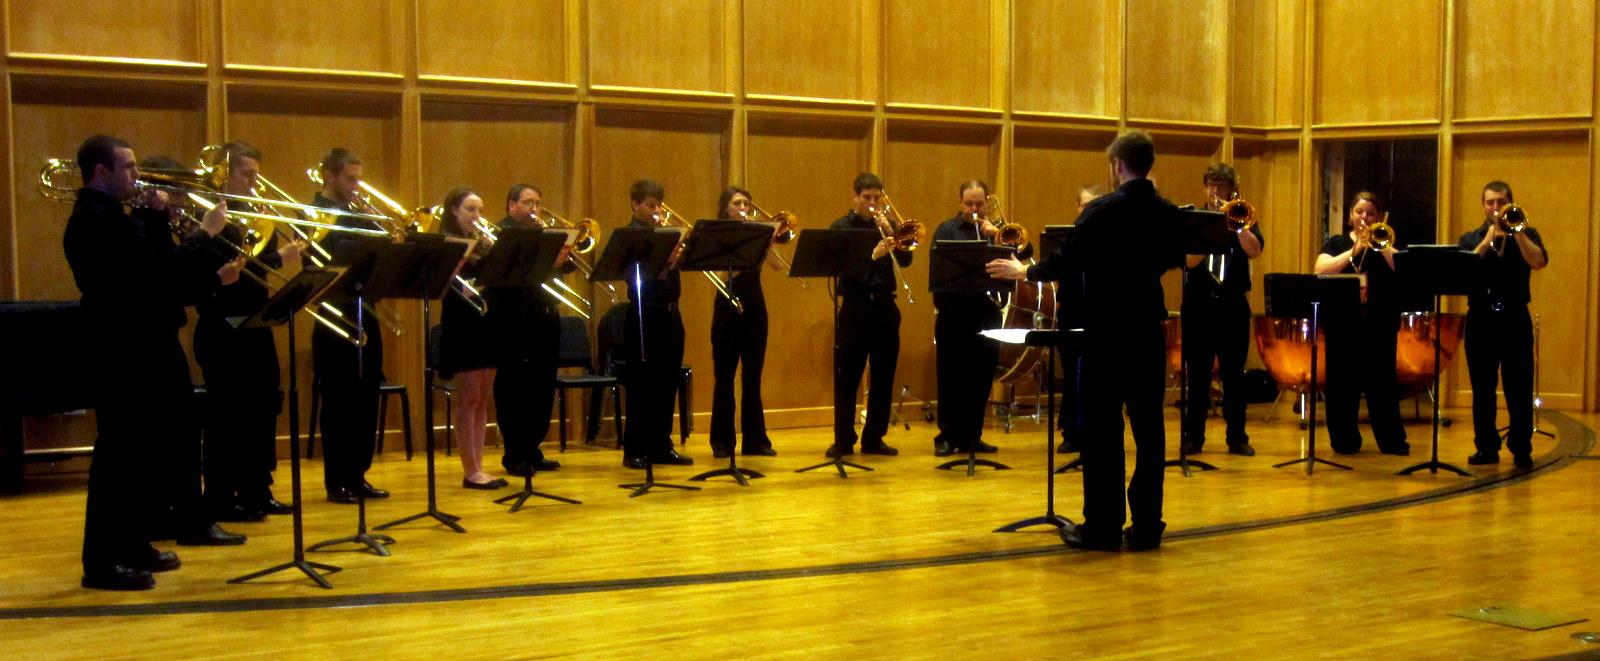 UD Trombone choir